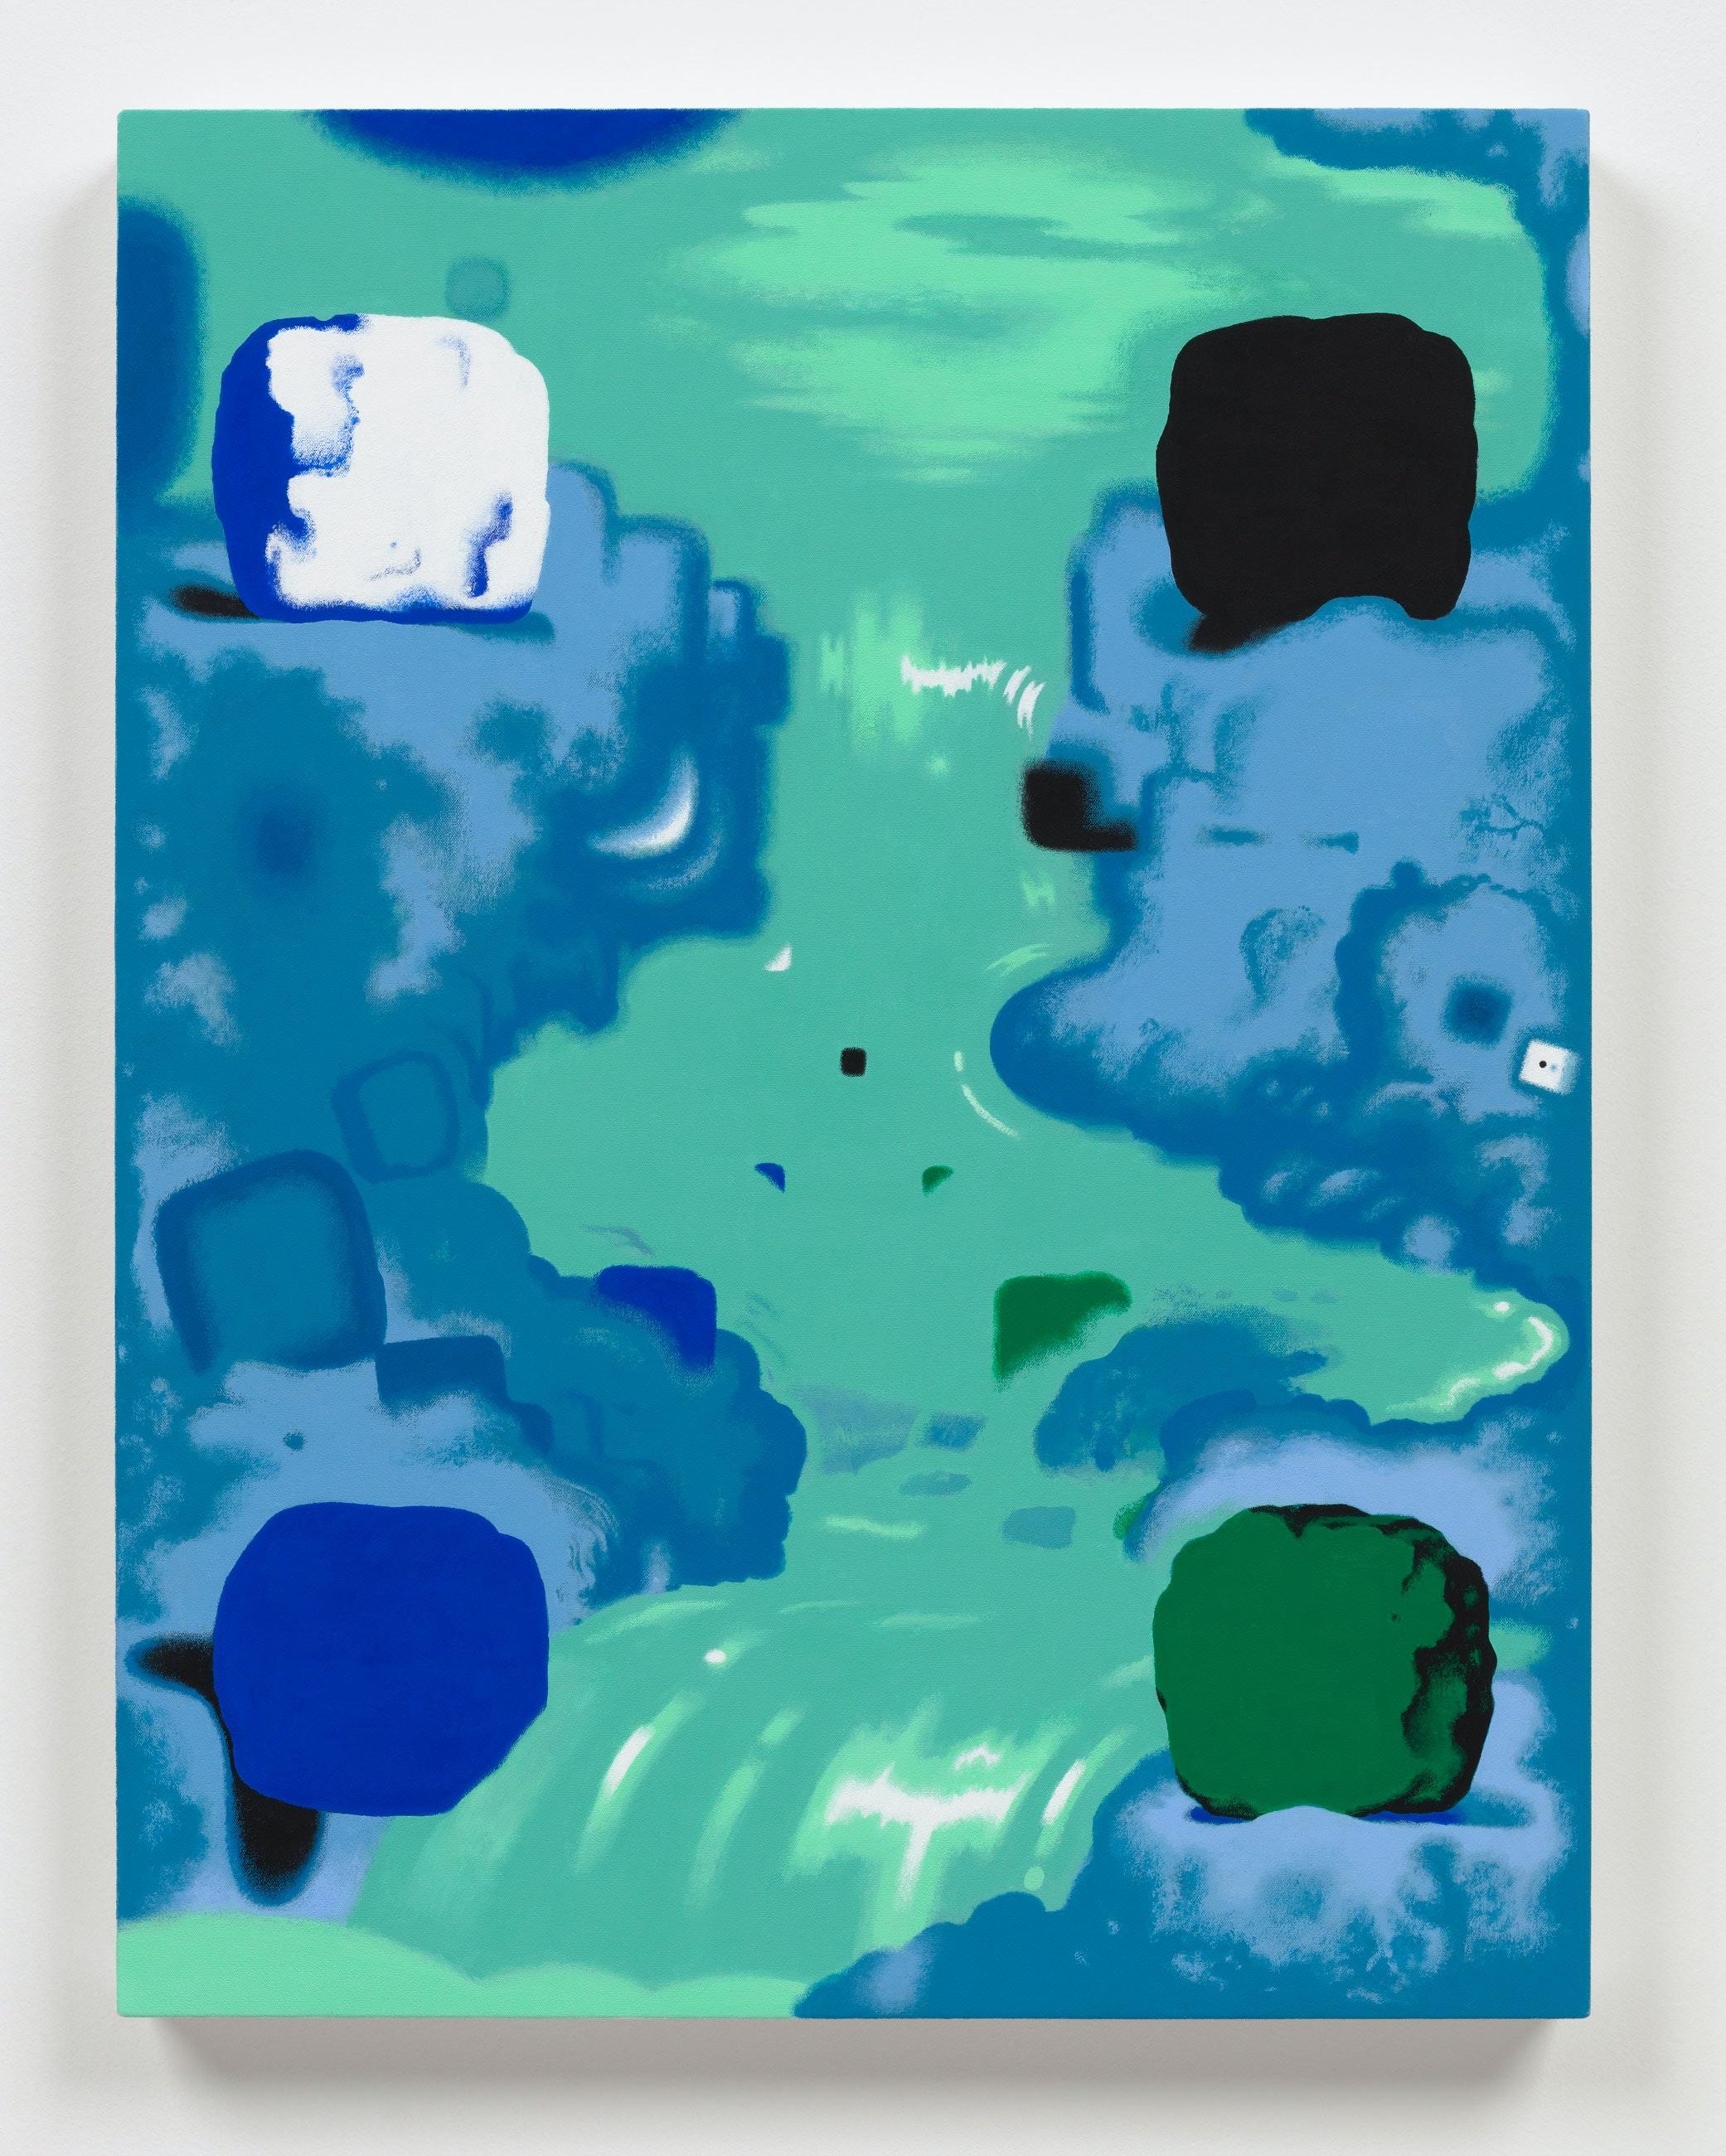 Joshua Marsh, <em>Shiii...</em>, 2021. Acrylic on canvas over panel, 22 x 17 inches. Courtesy Mother Gallery, Beacon.